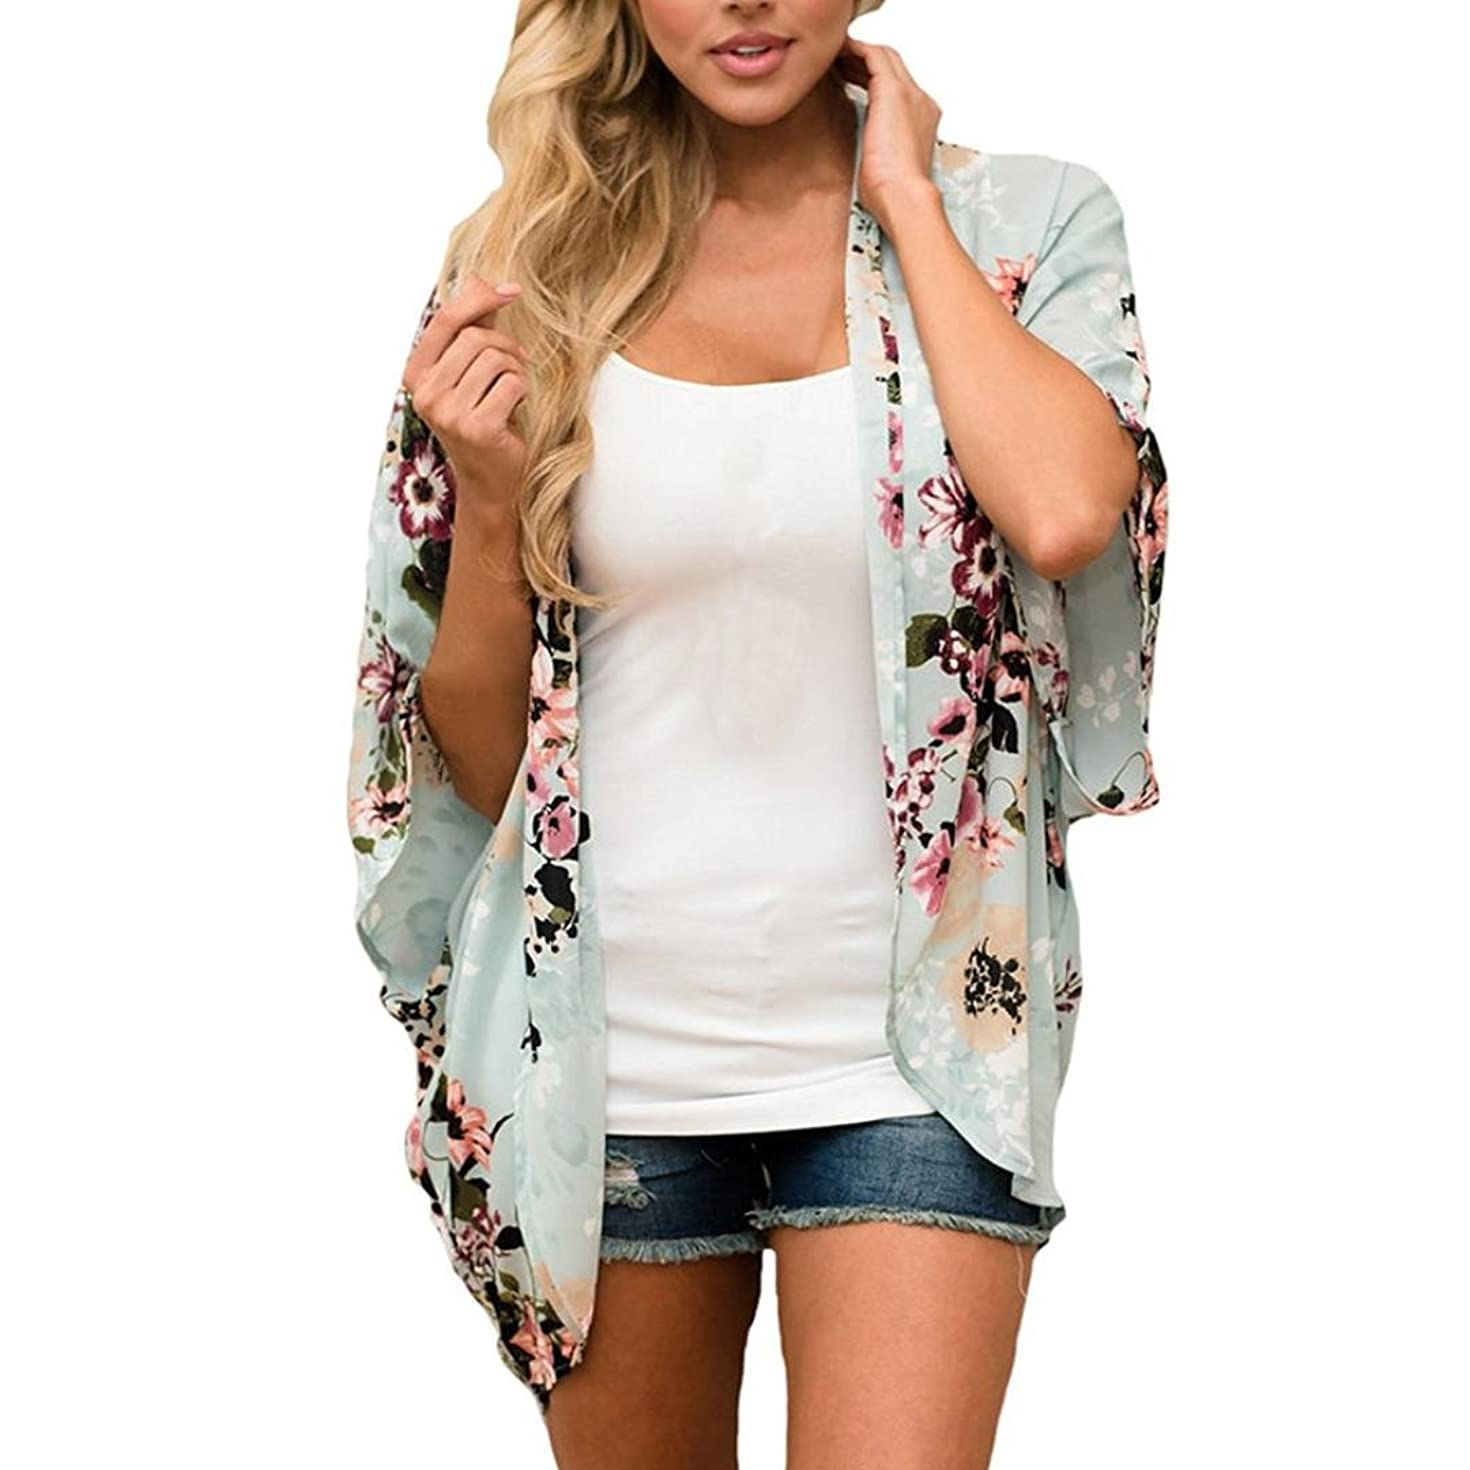 ManxiVoo Women Floral Cover Up Chiffon Kimono Sunscreen Shirt Loose Swimsuit Bikini Shawl Wraps Bikini Smock Tops